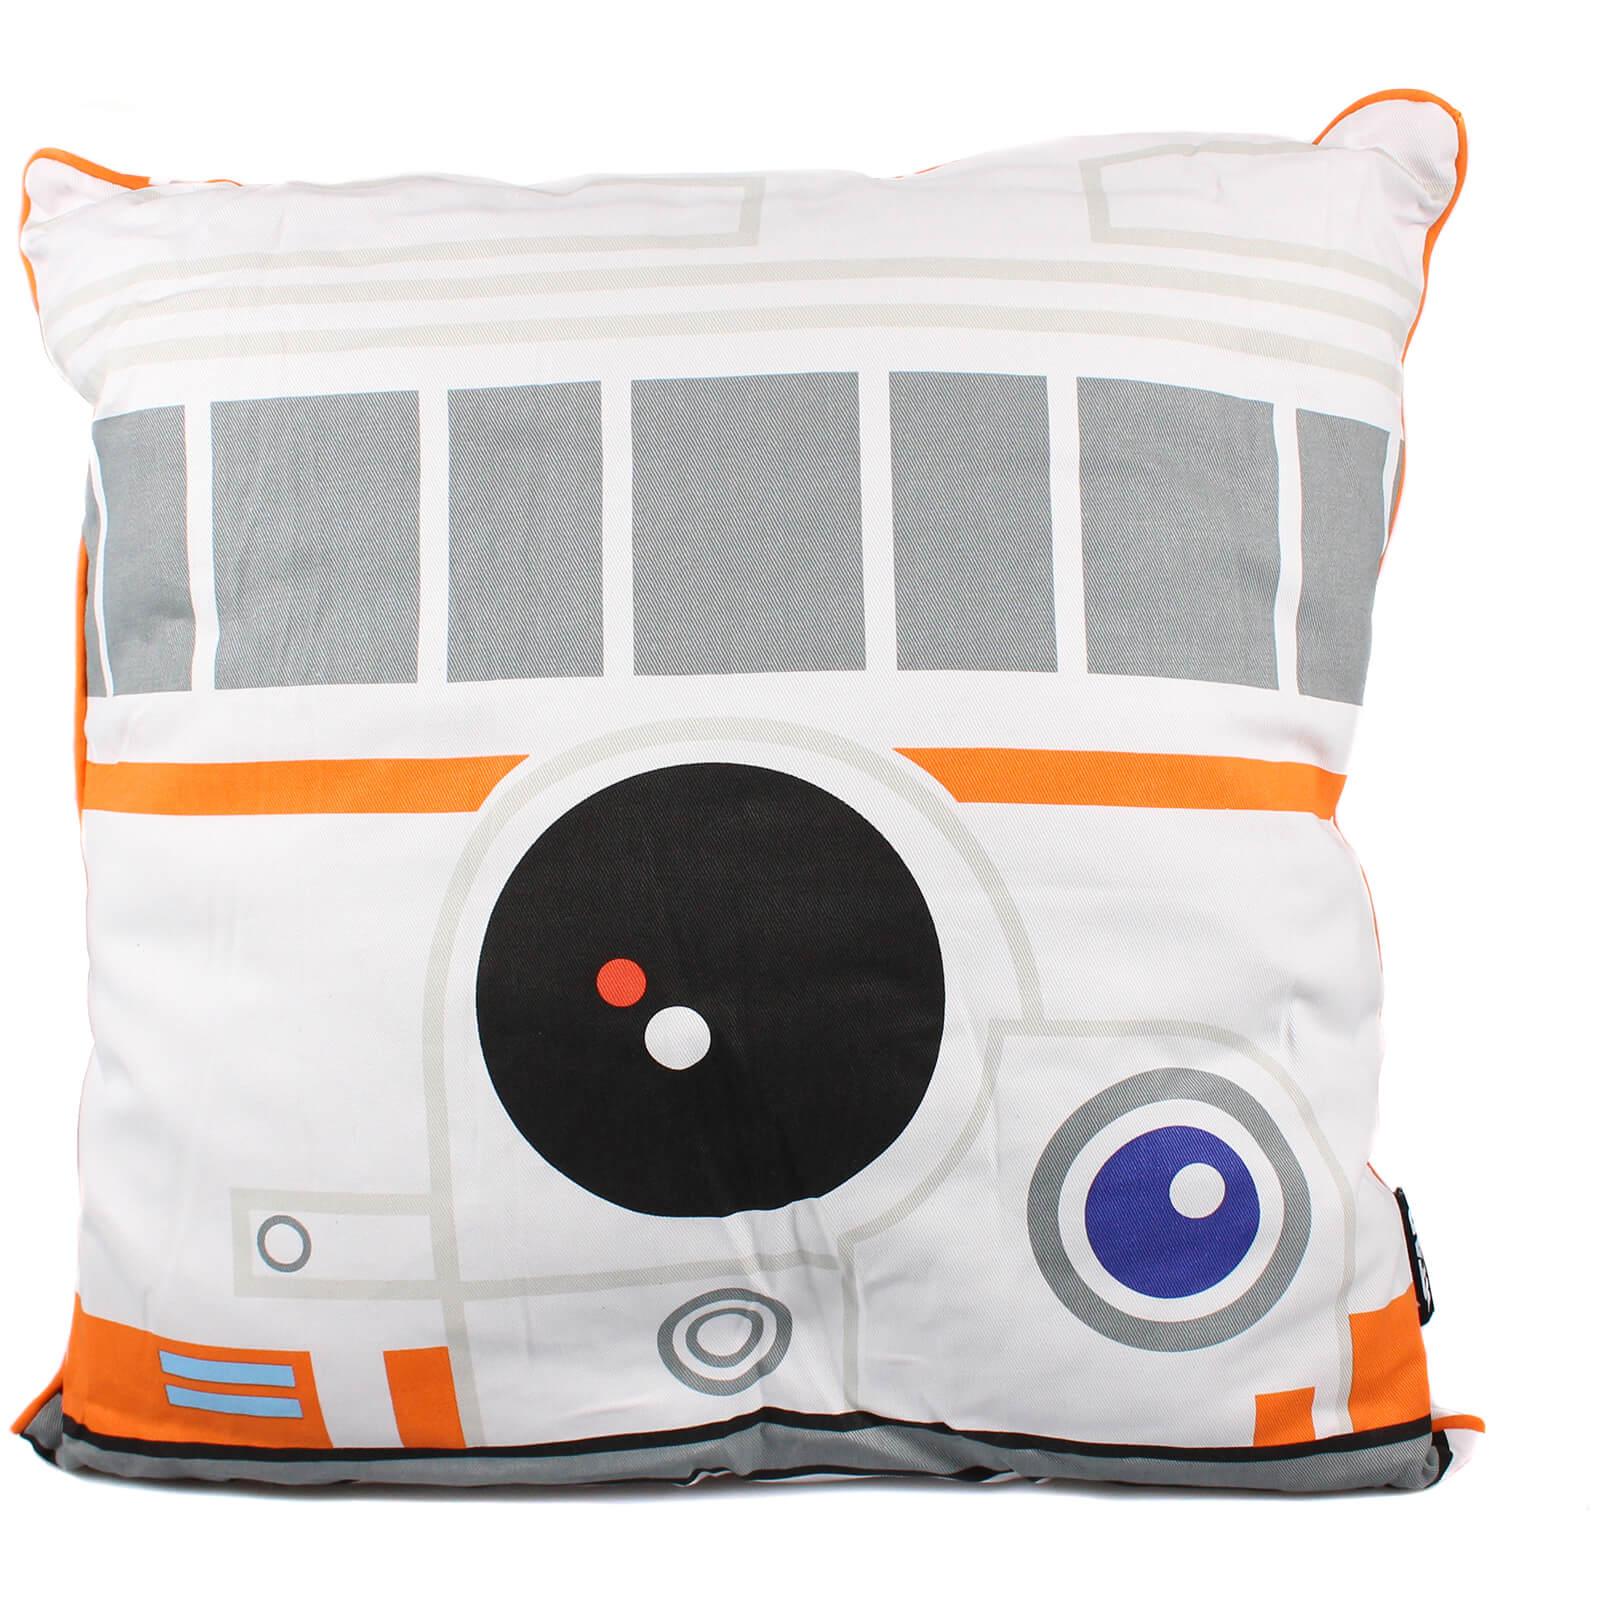 Star Wars BB-8 Filled Cushion